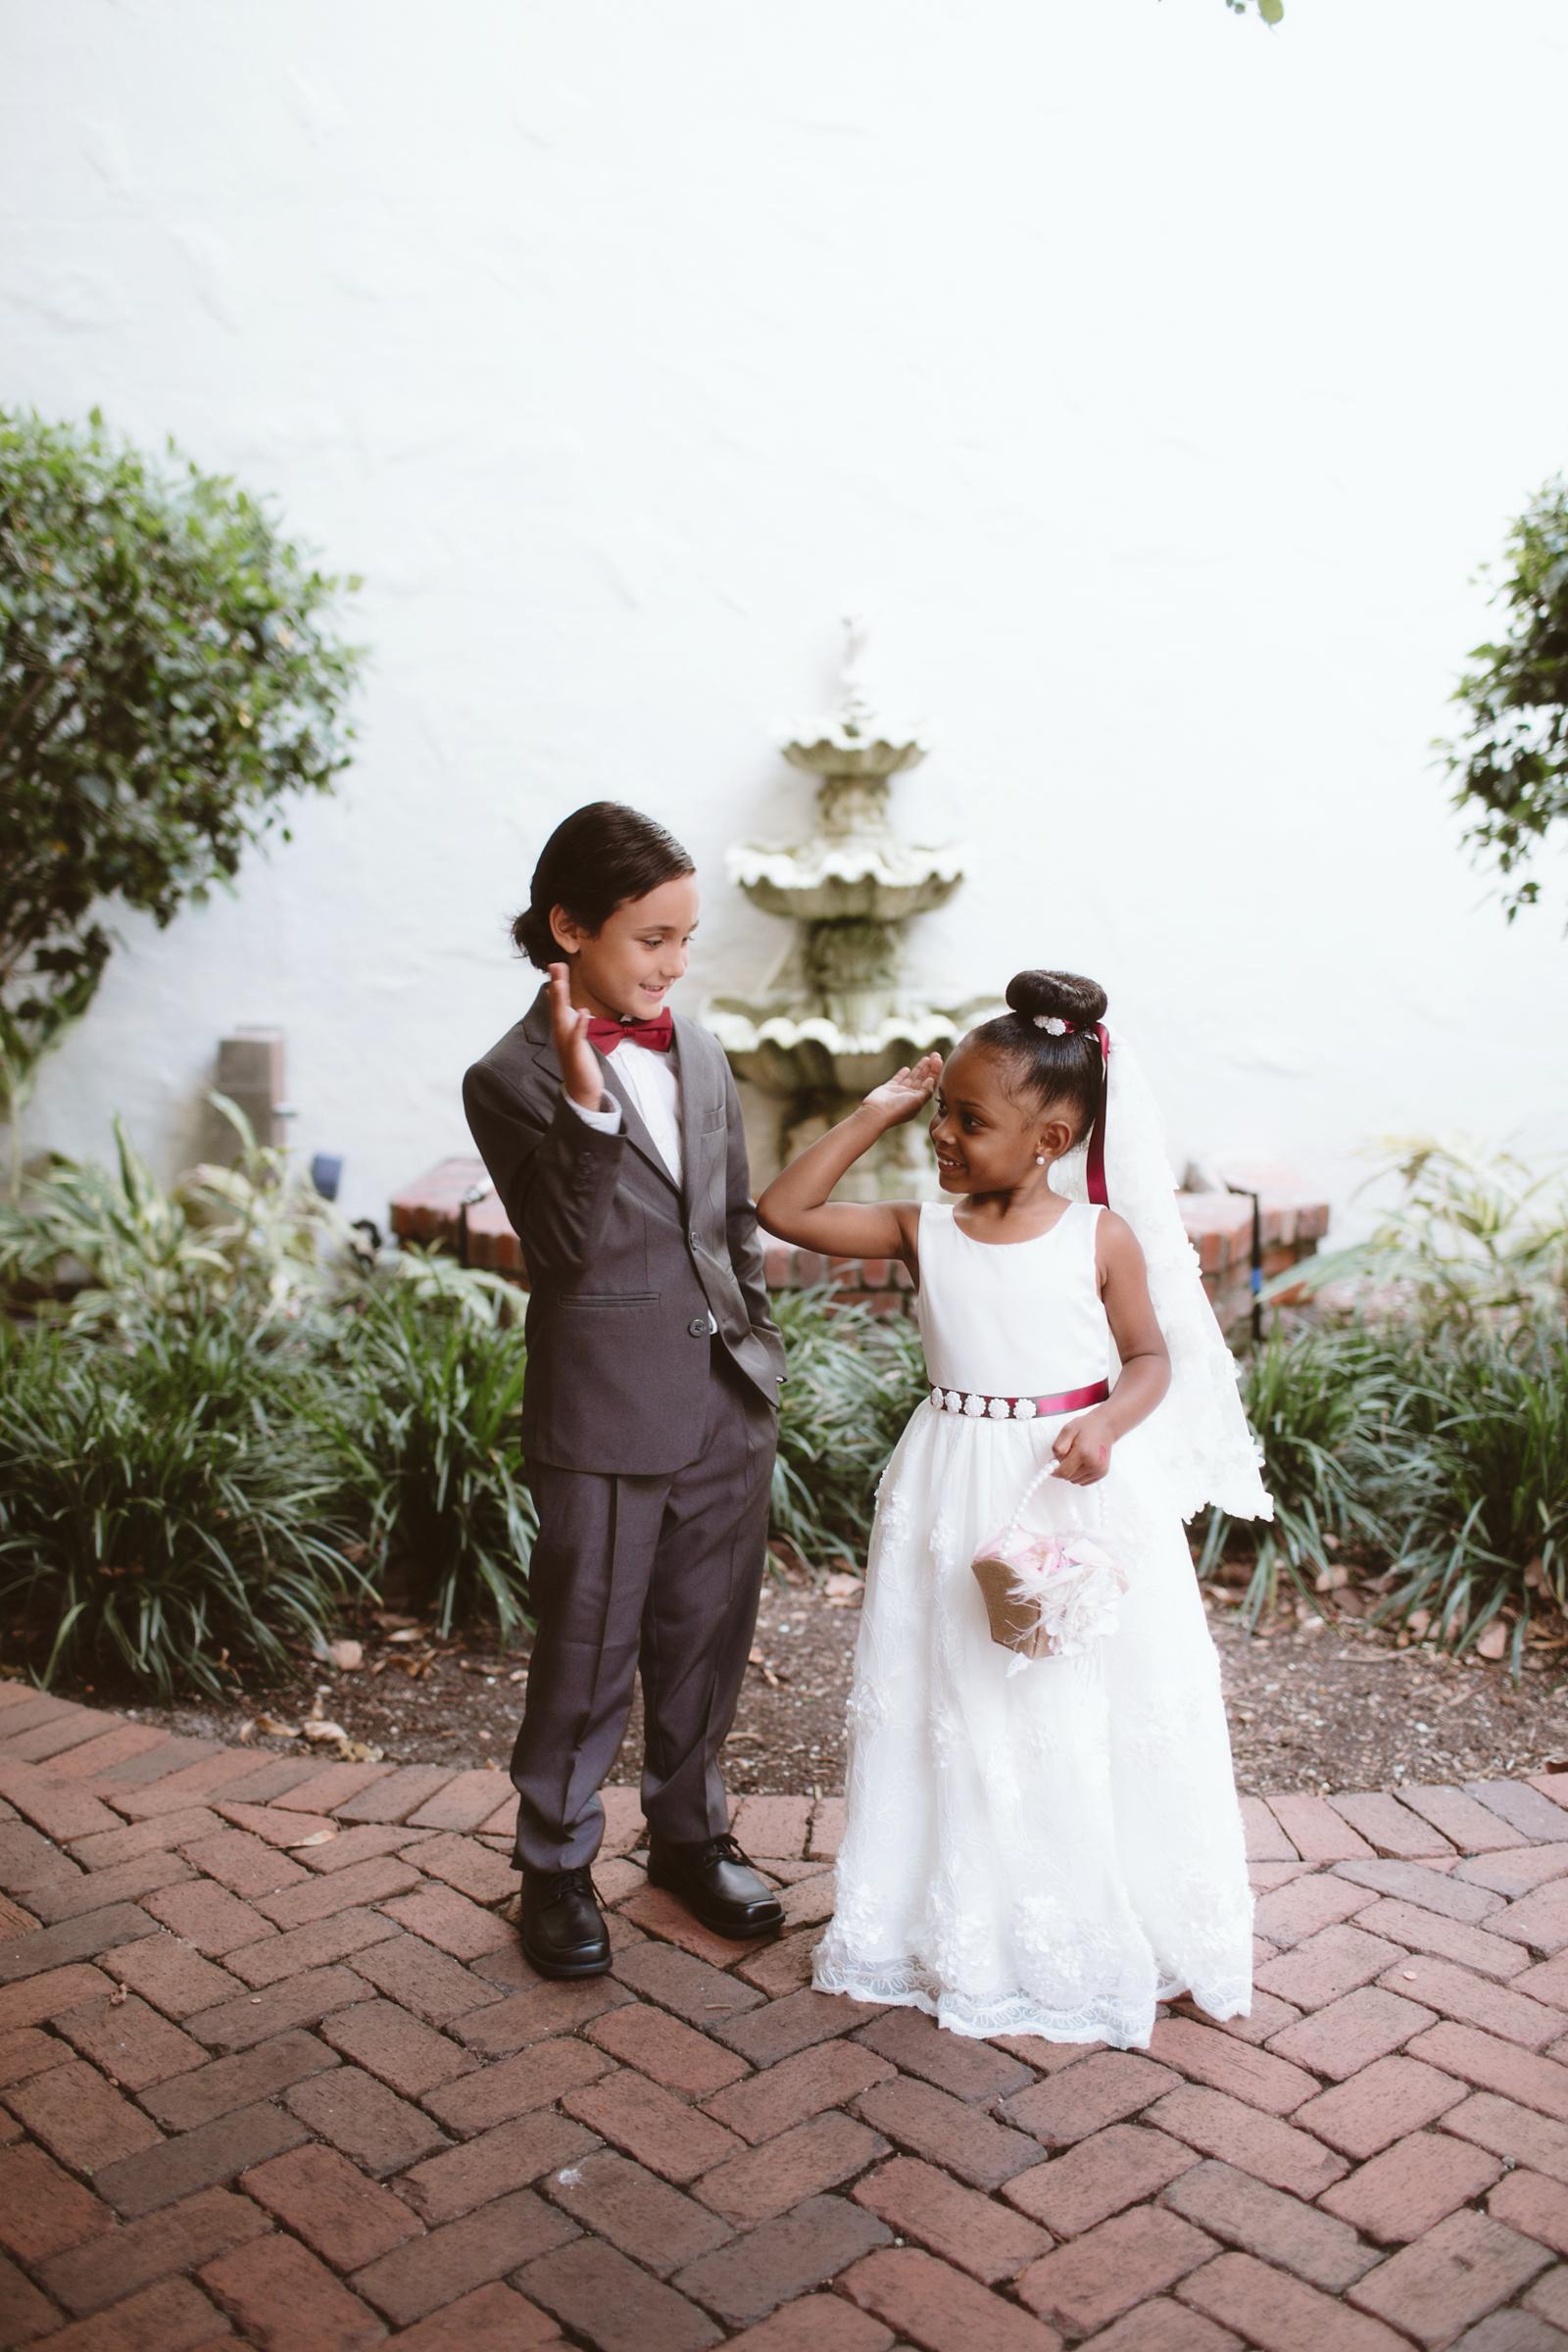 wedding day | MFA St Pete | Vanessa Boy Photography | vanessaboy.com-273.com |final.jpg